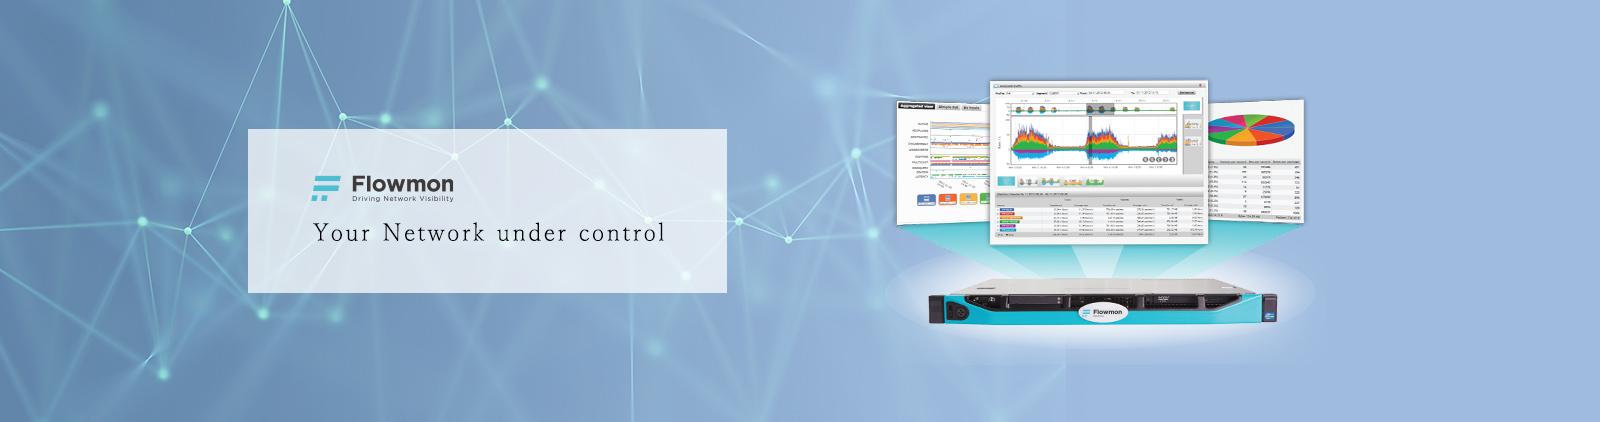 Flowmon Your Network under control